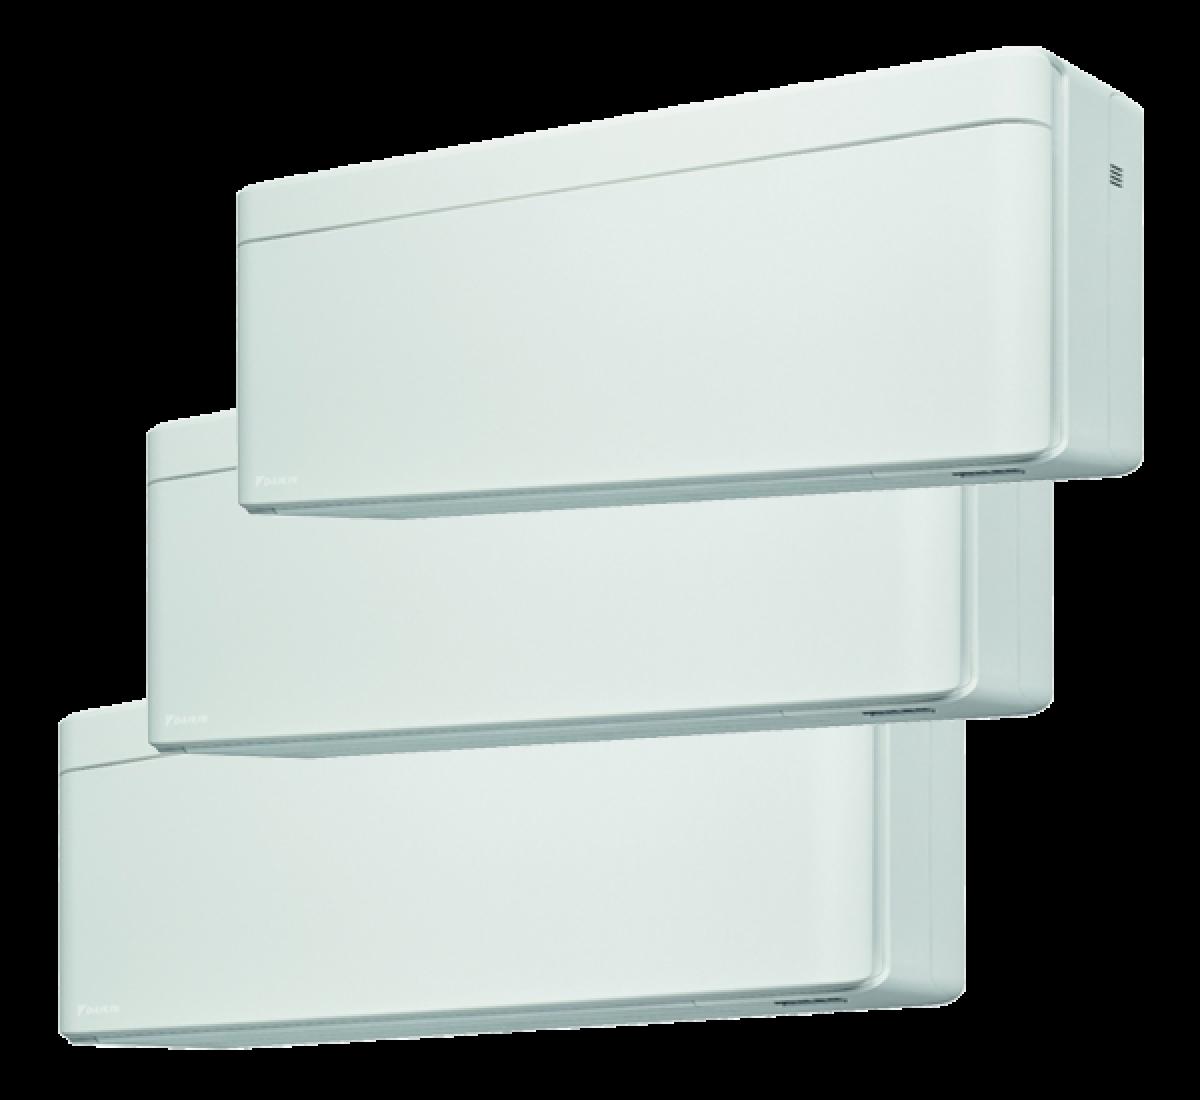 Multisplit Aire Acondicionado Equipo Interior Daikin Serie Comfora FTXA35-AW-FTXA20-AW-FTXA25-AW